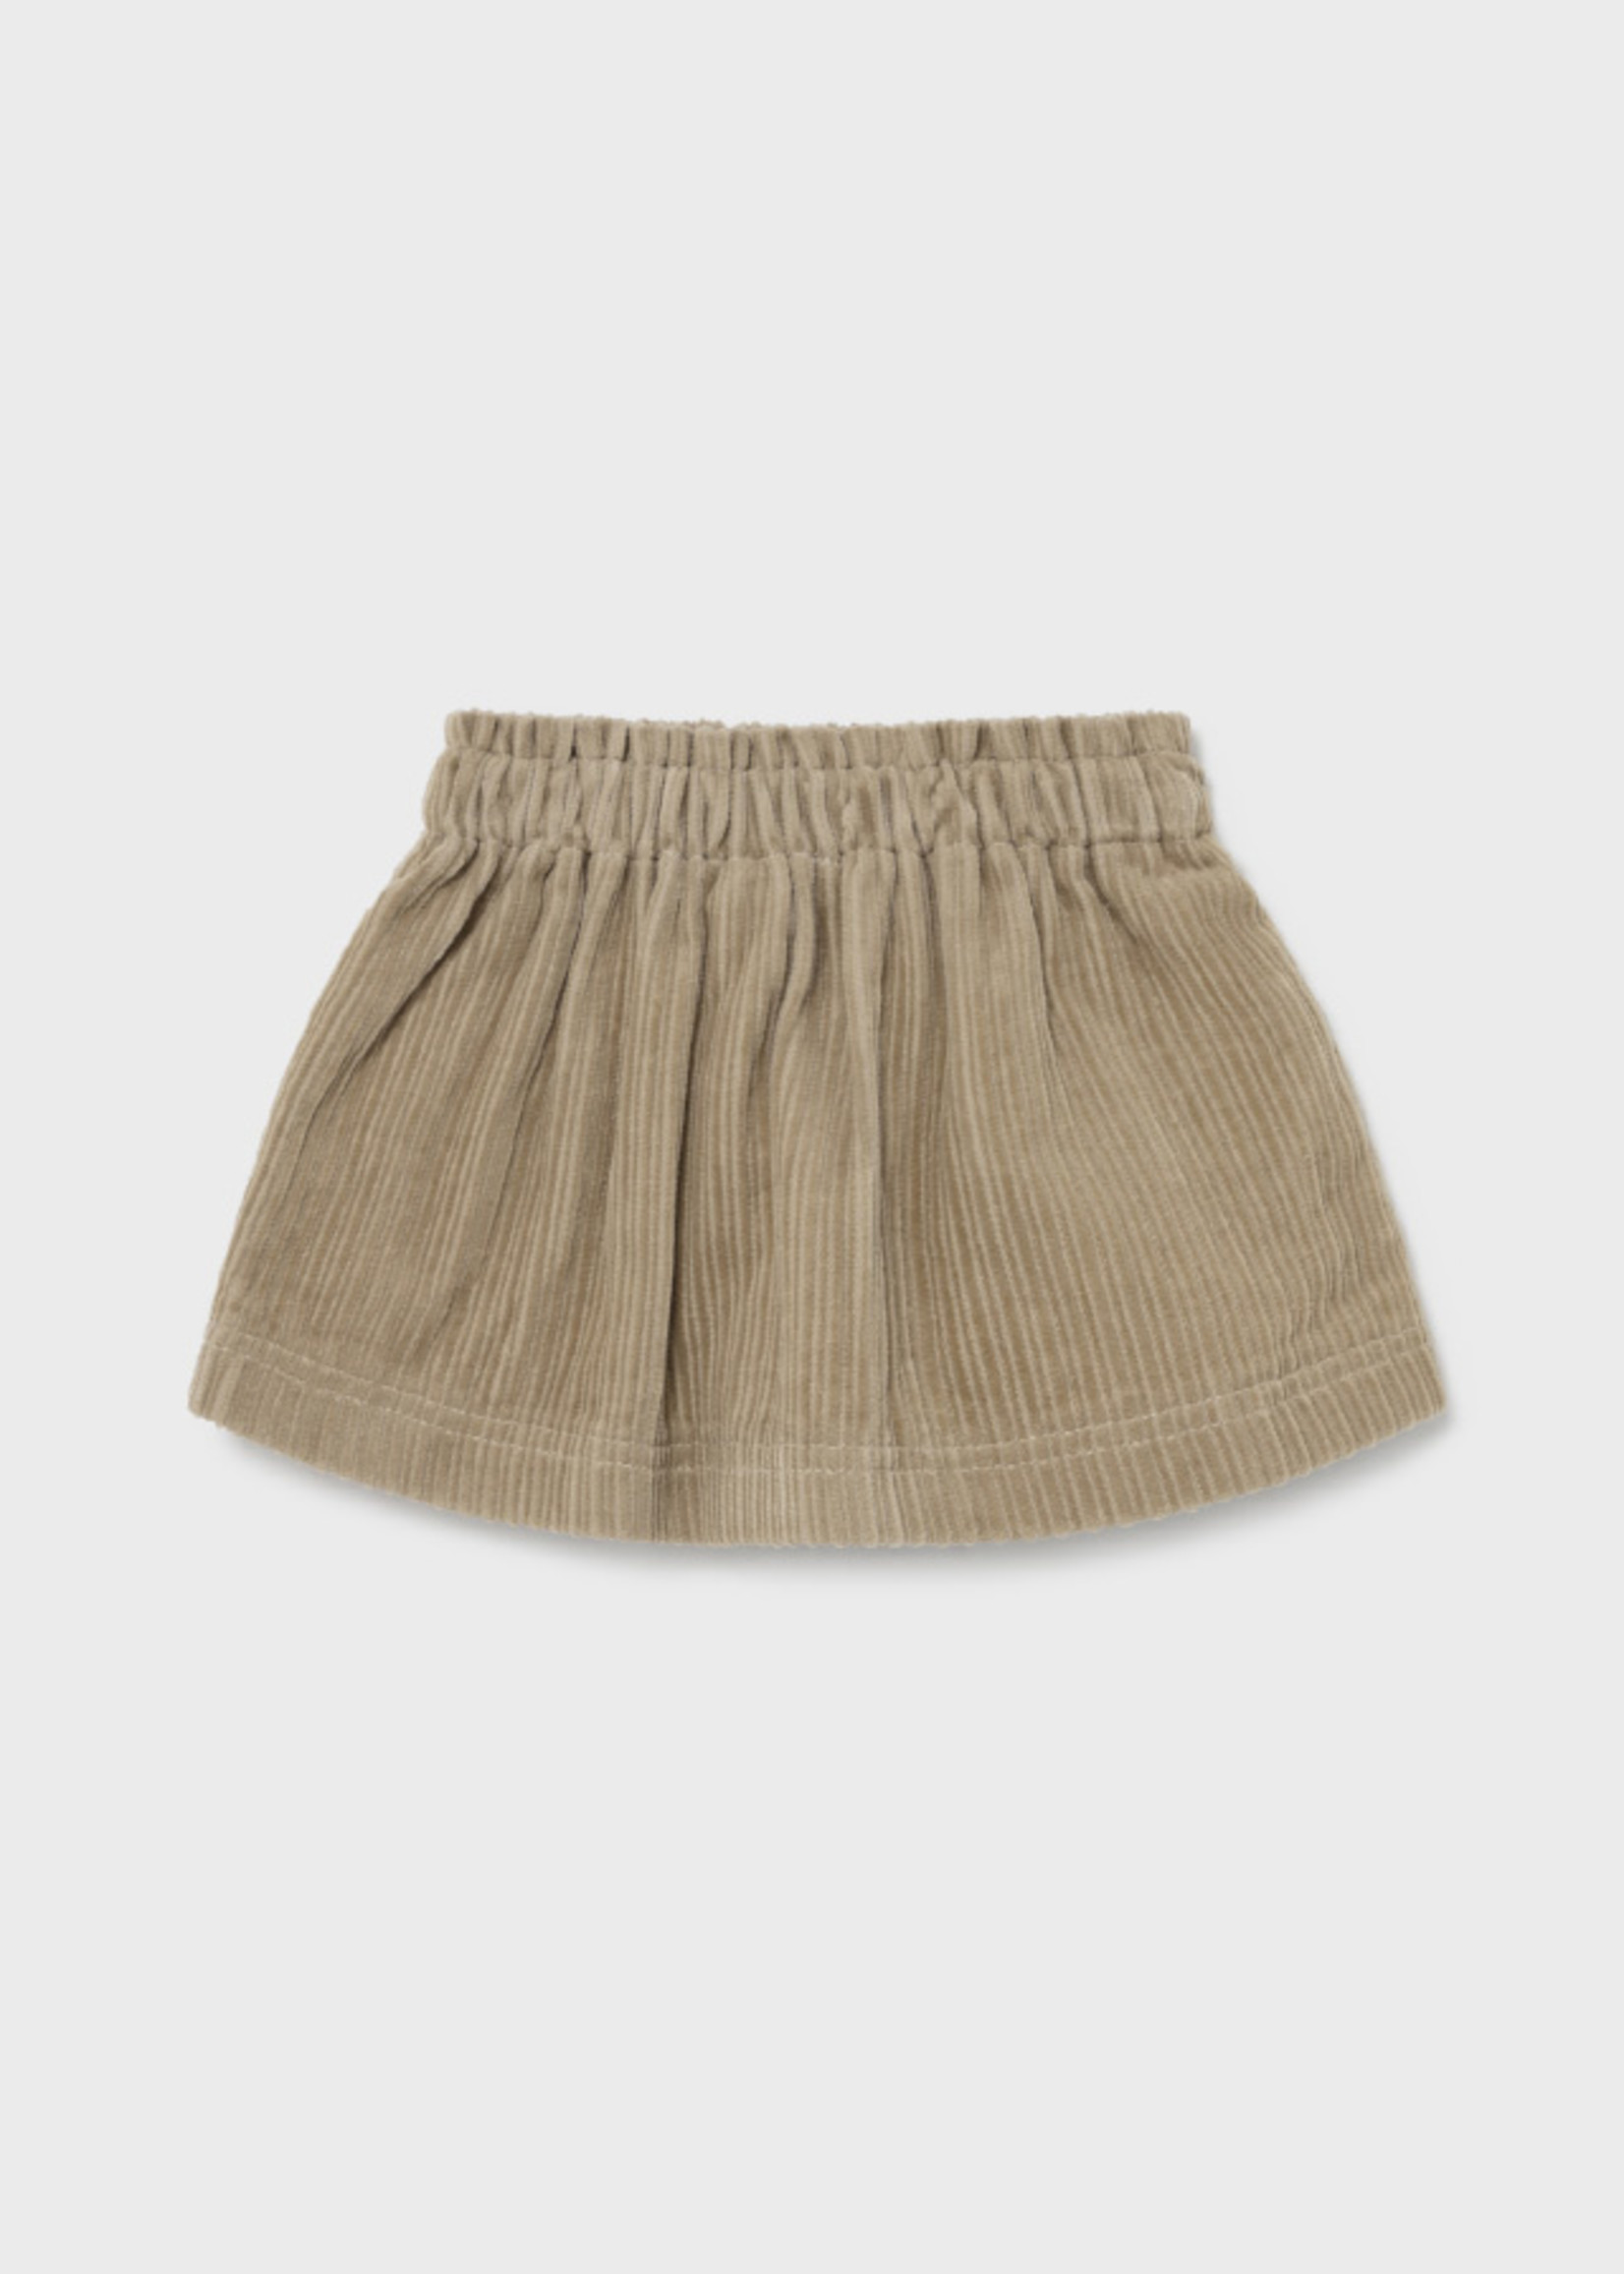 Mayoral Mayoral corduroy skirt sand